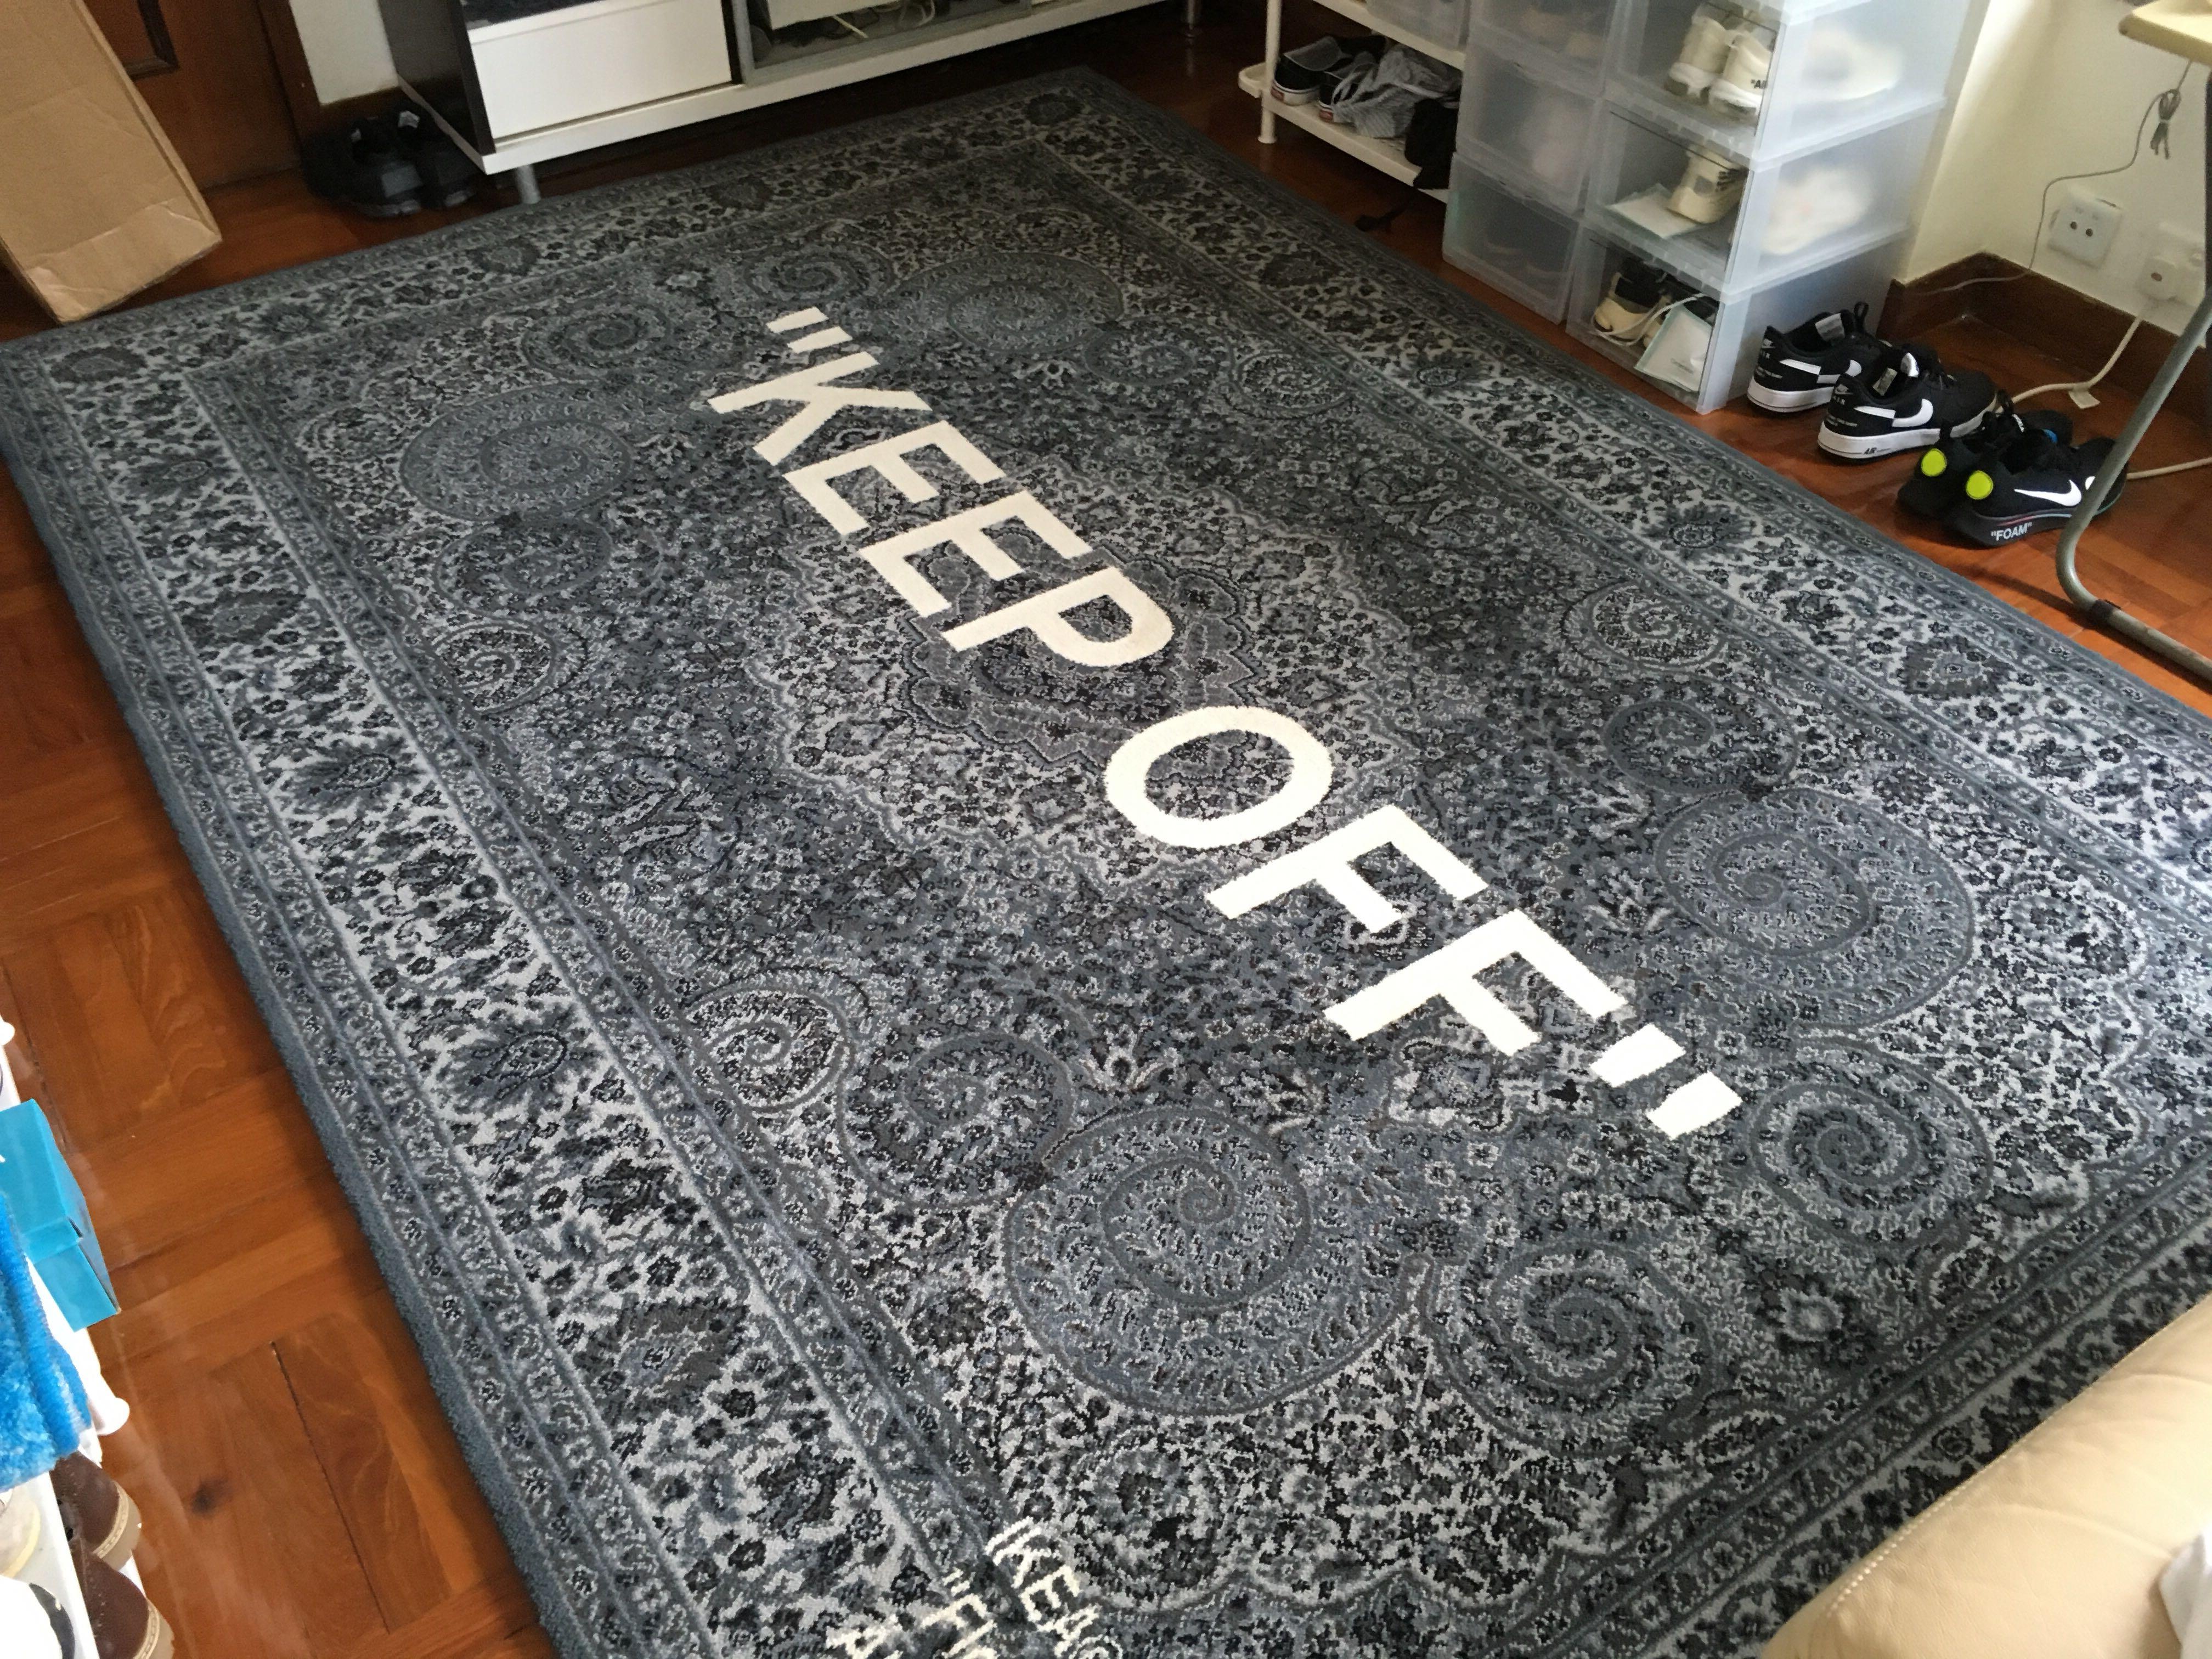 賣off white keep off rug 只係拆出來影左張相 9成新